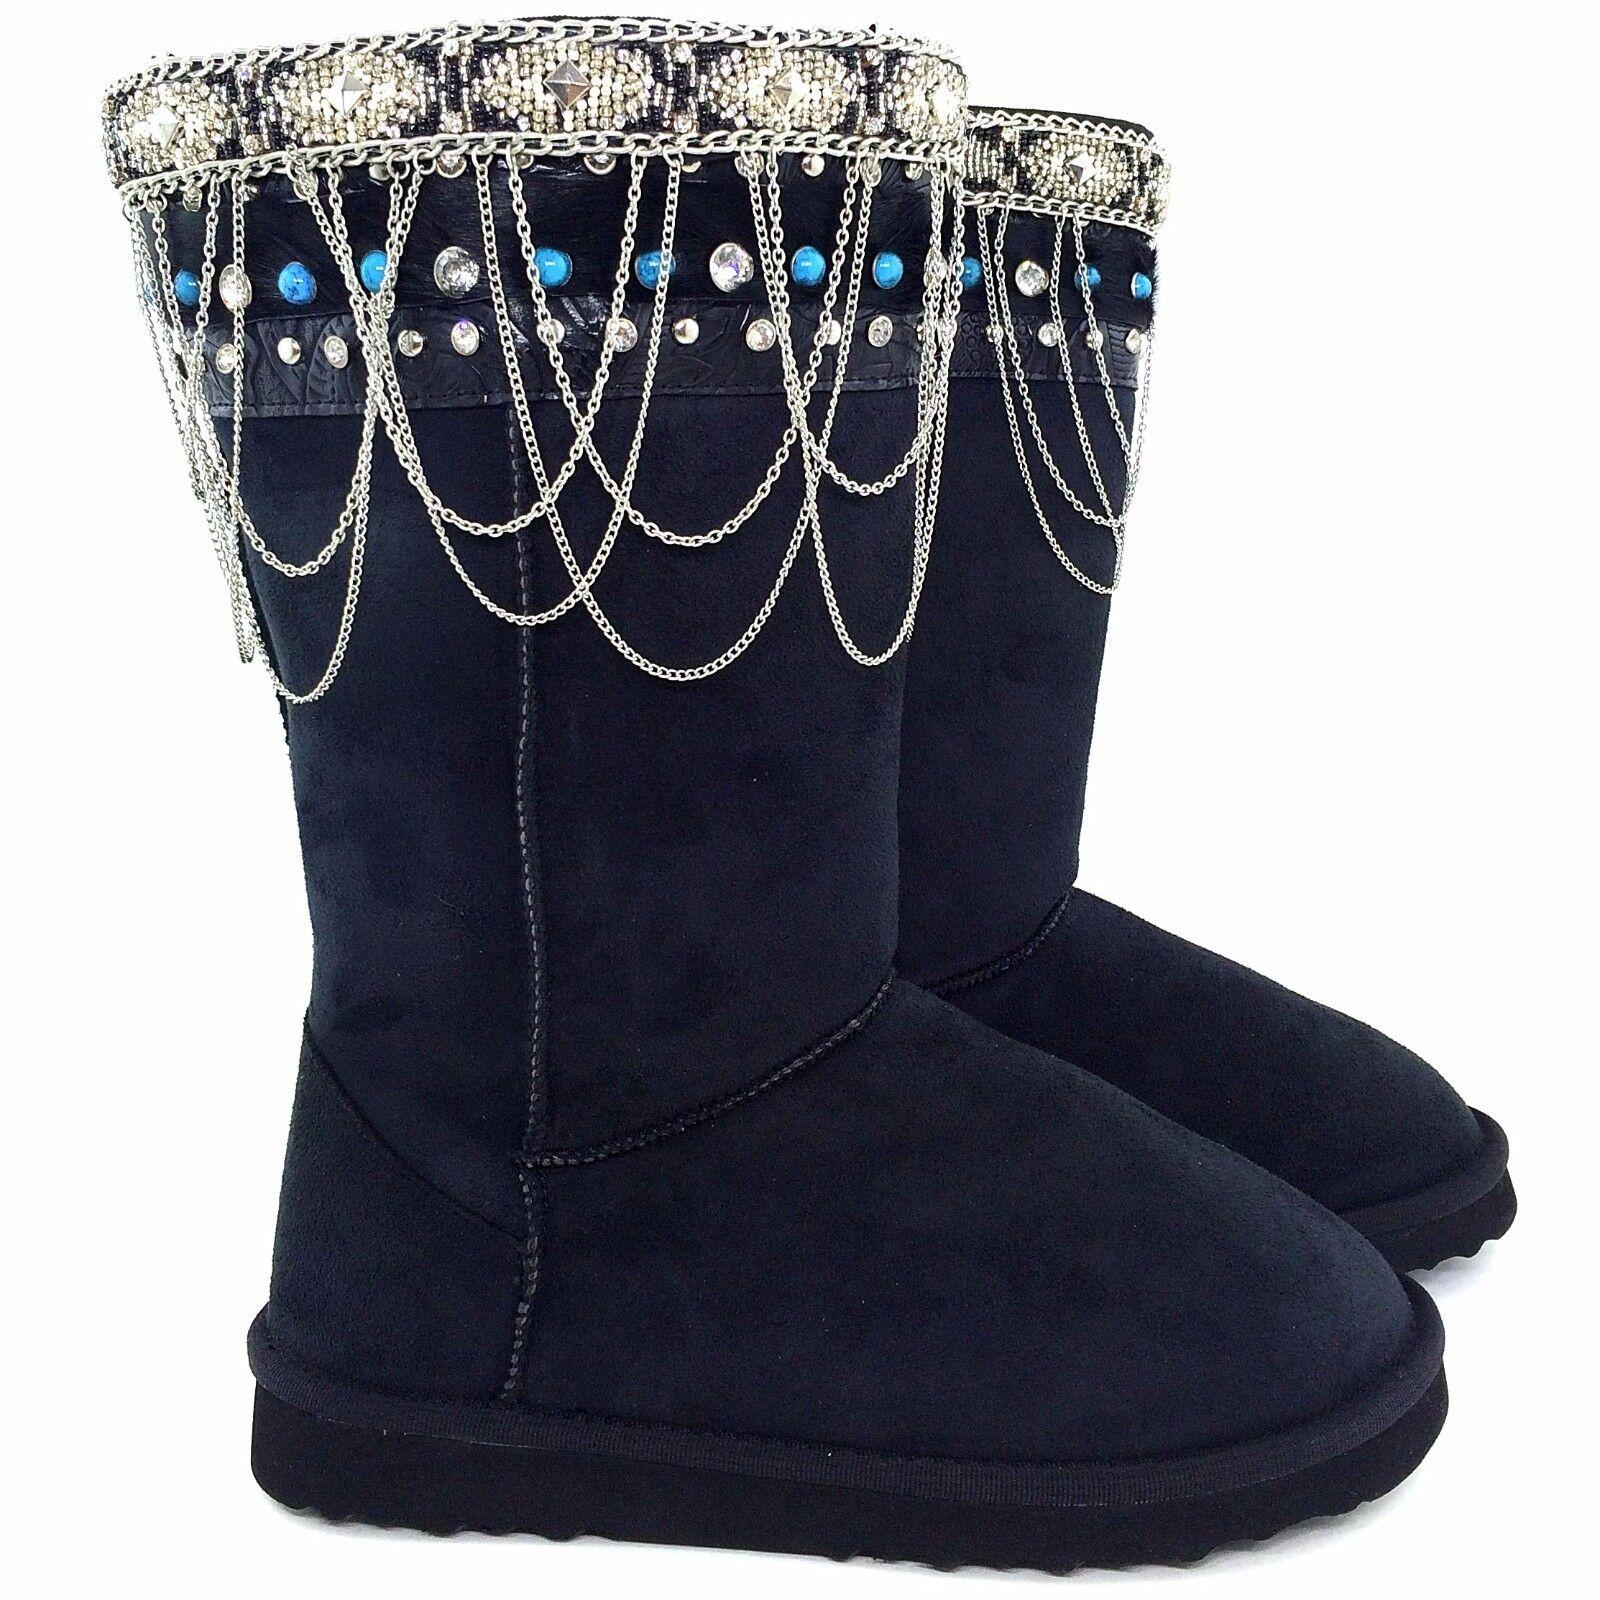 Black Chiseled Tooled Western Rhinestone Like Montana West Winter Boots Boot Top